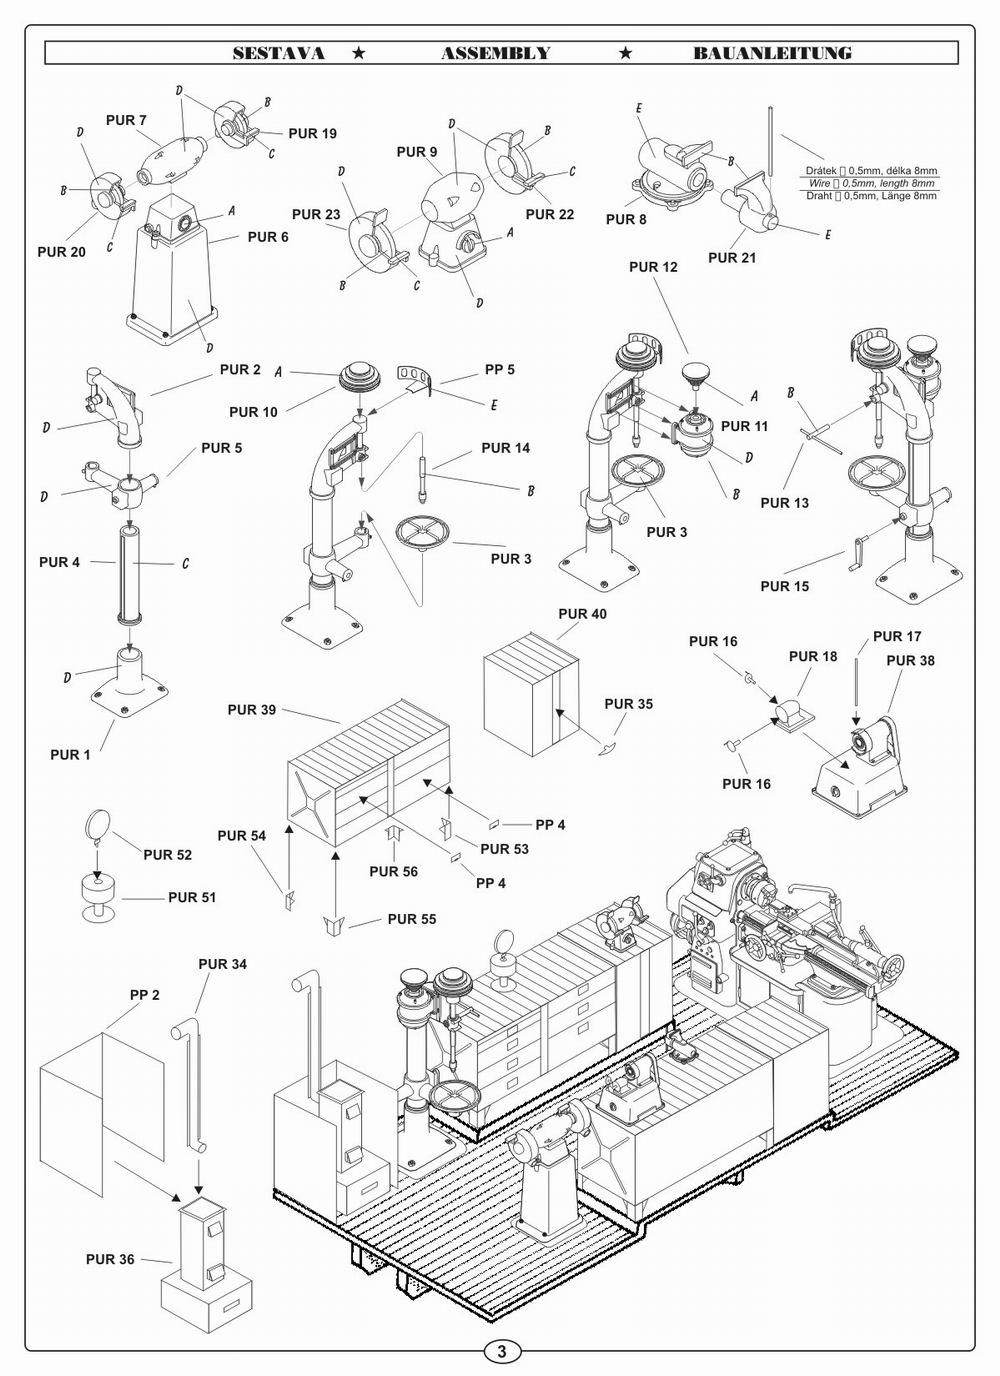 Fantastisch Flexible Computerkabelabdeckung Galerie - Elektrische ...